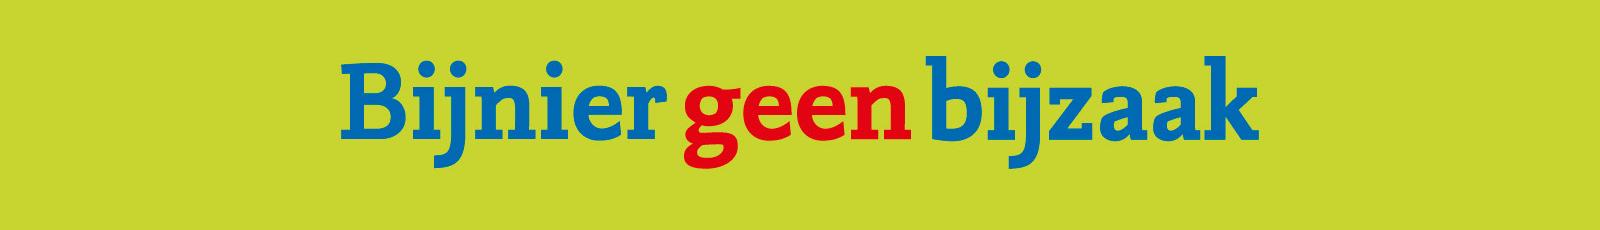 logo https://www.bijniergeenbijzaak.nl